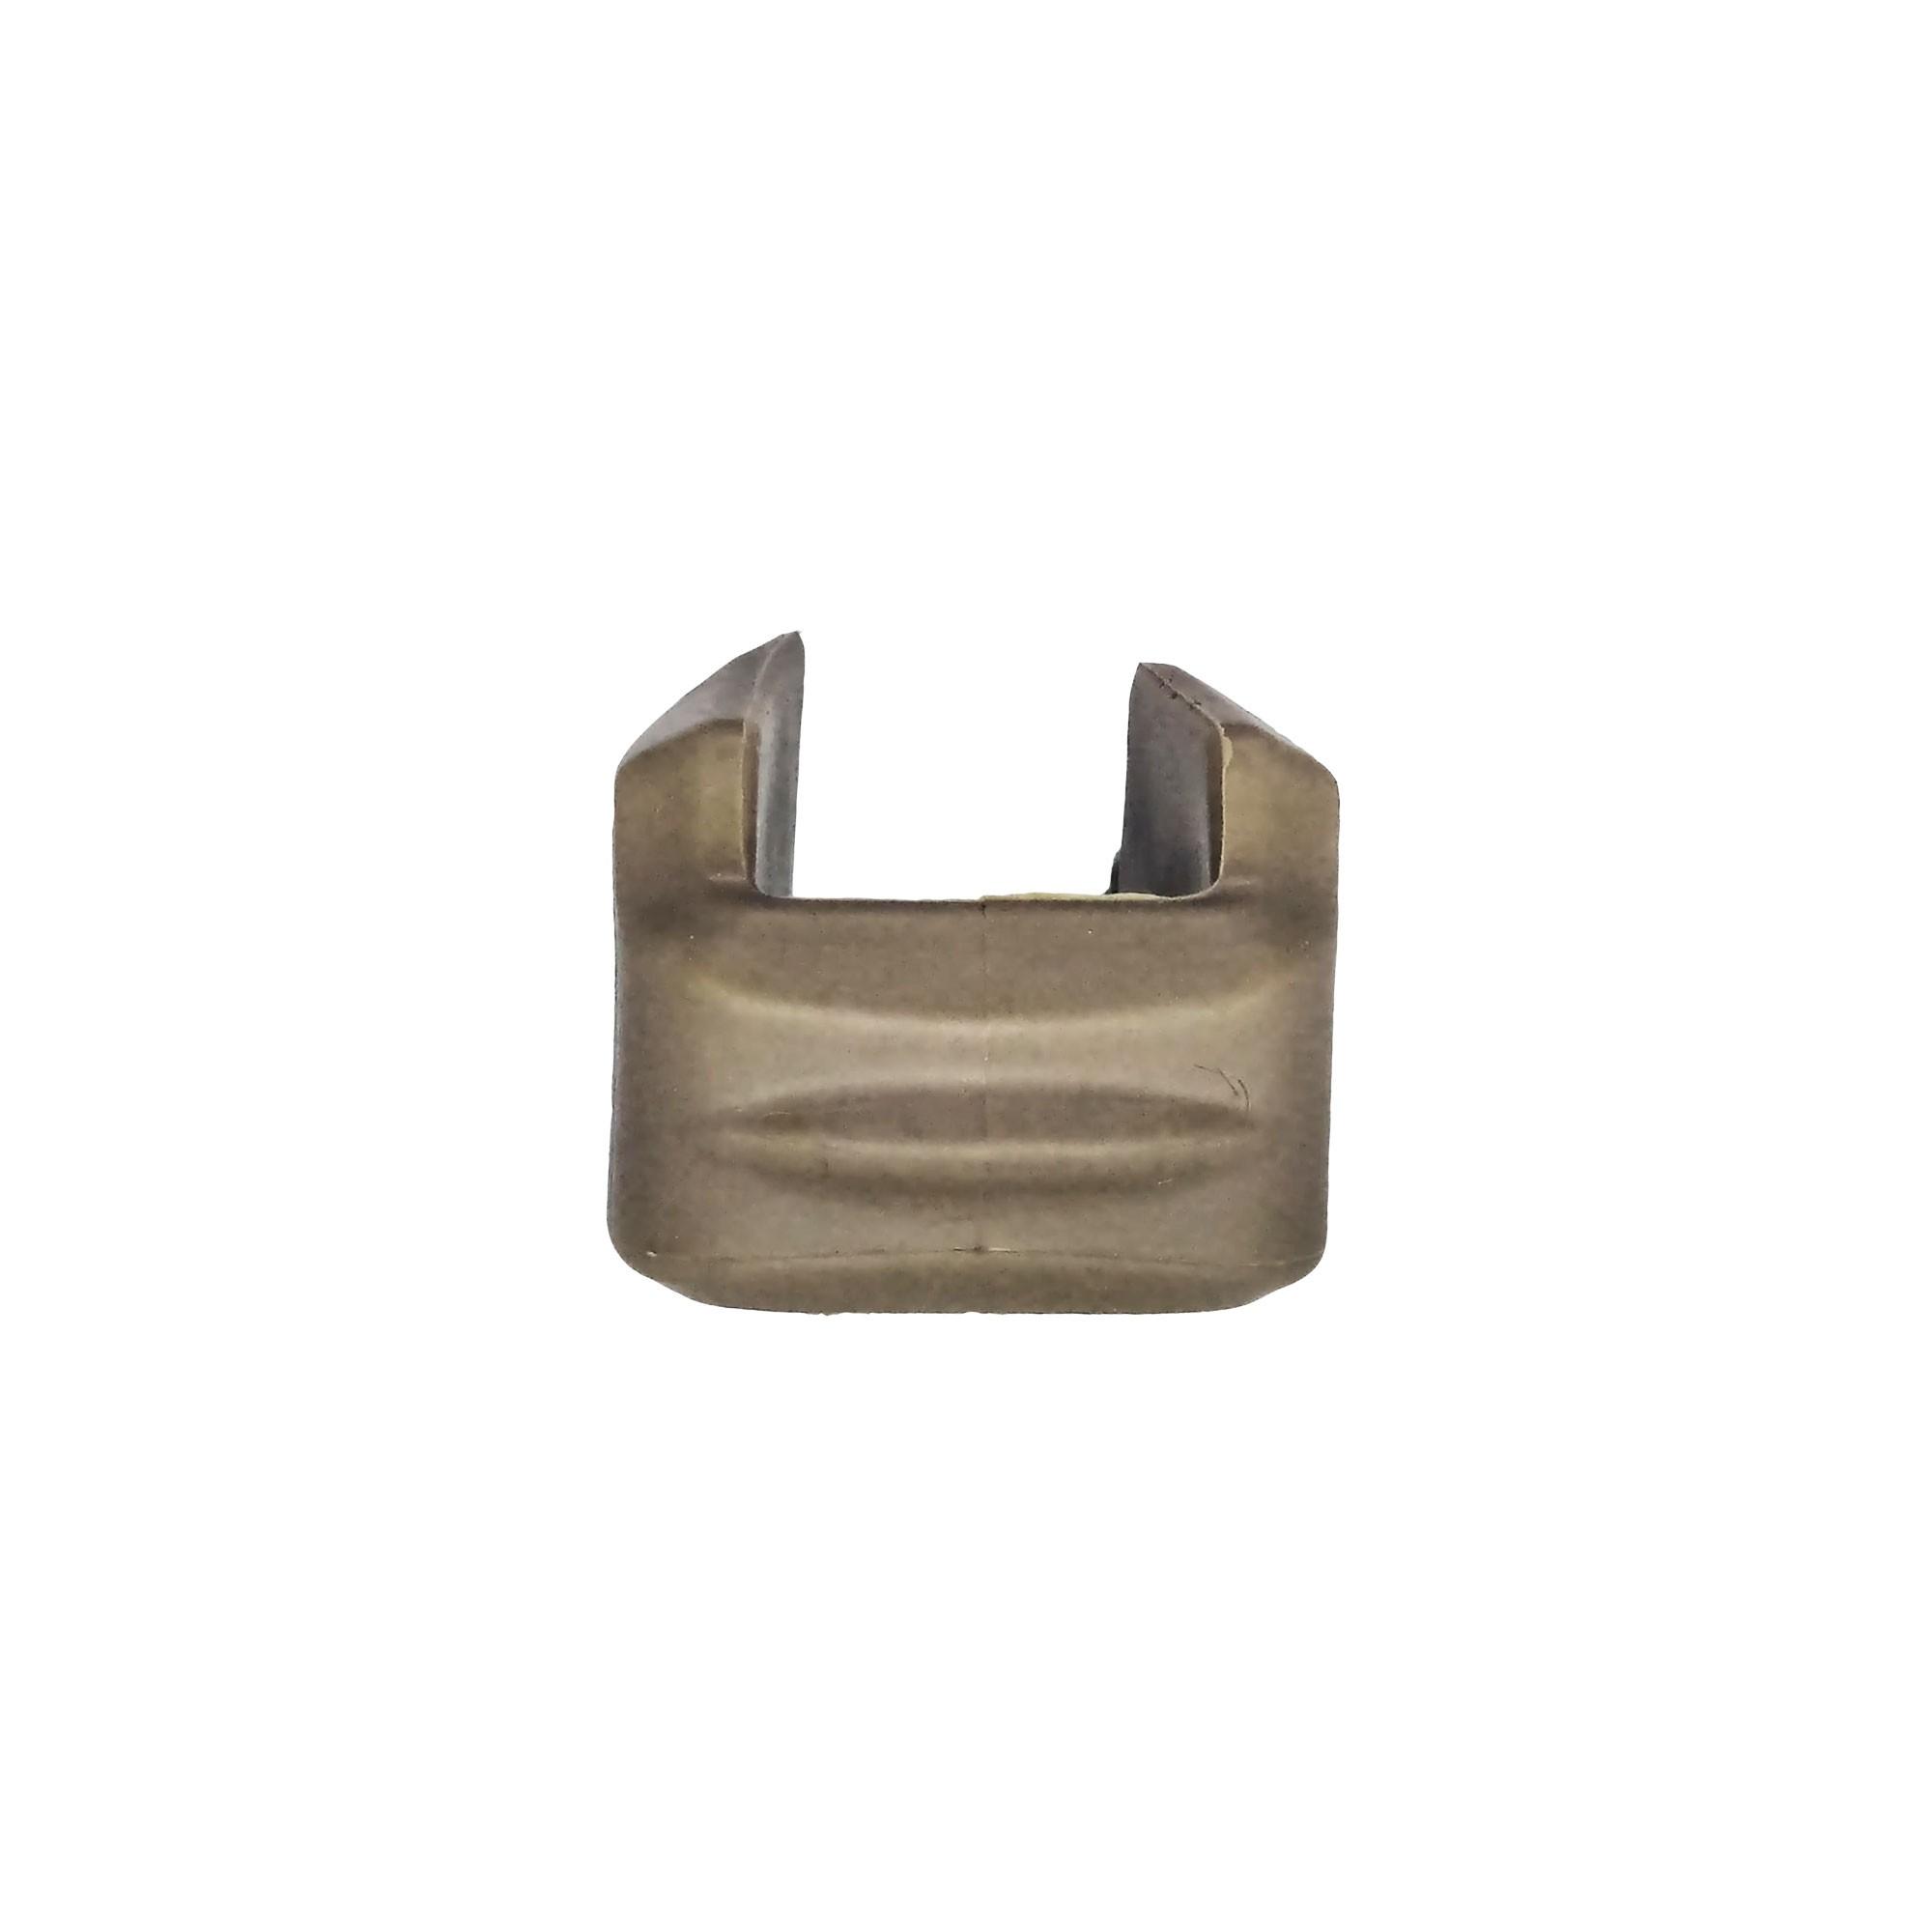 Grip p/ Carregador - Rubber NQ Grip Tac